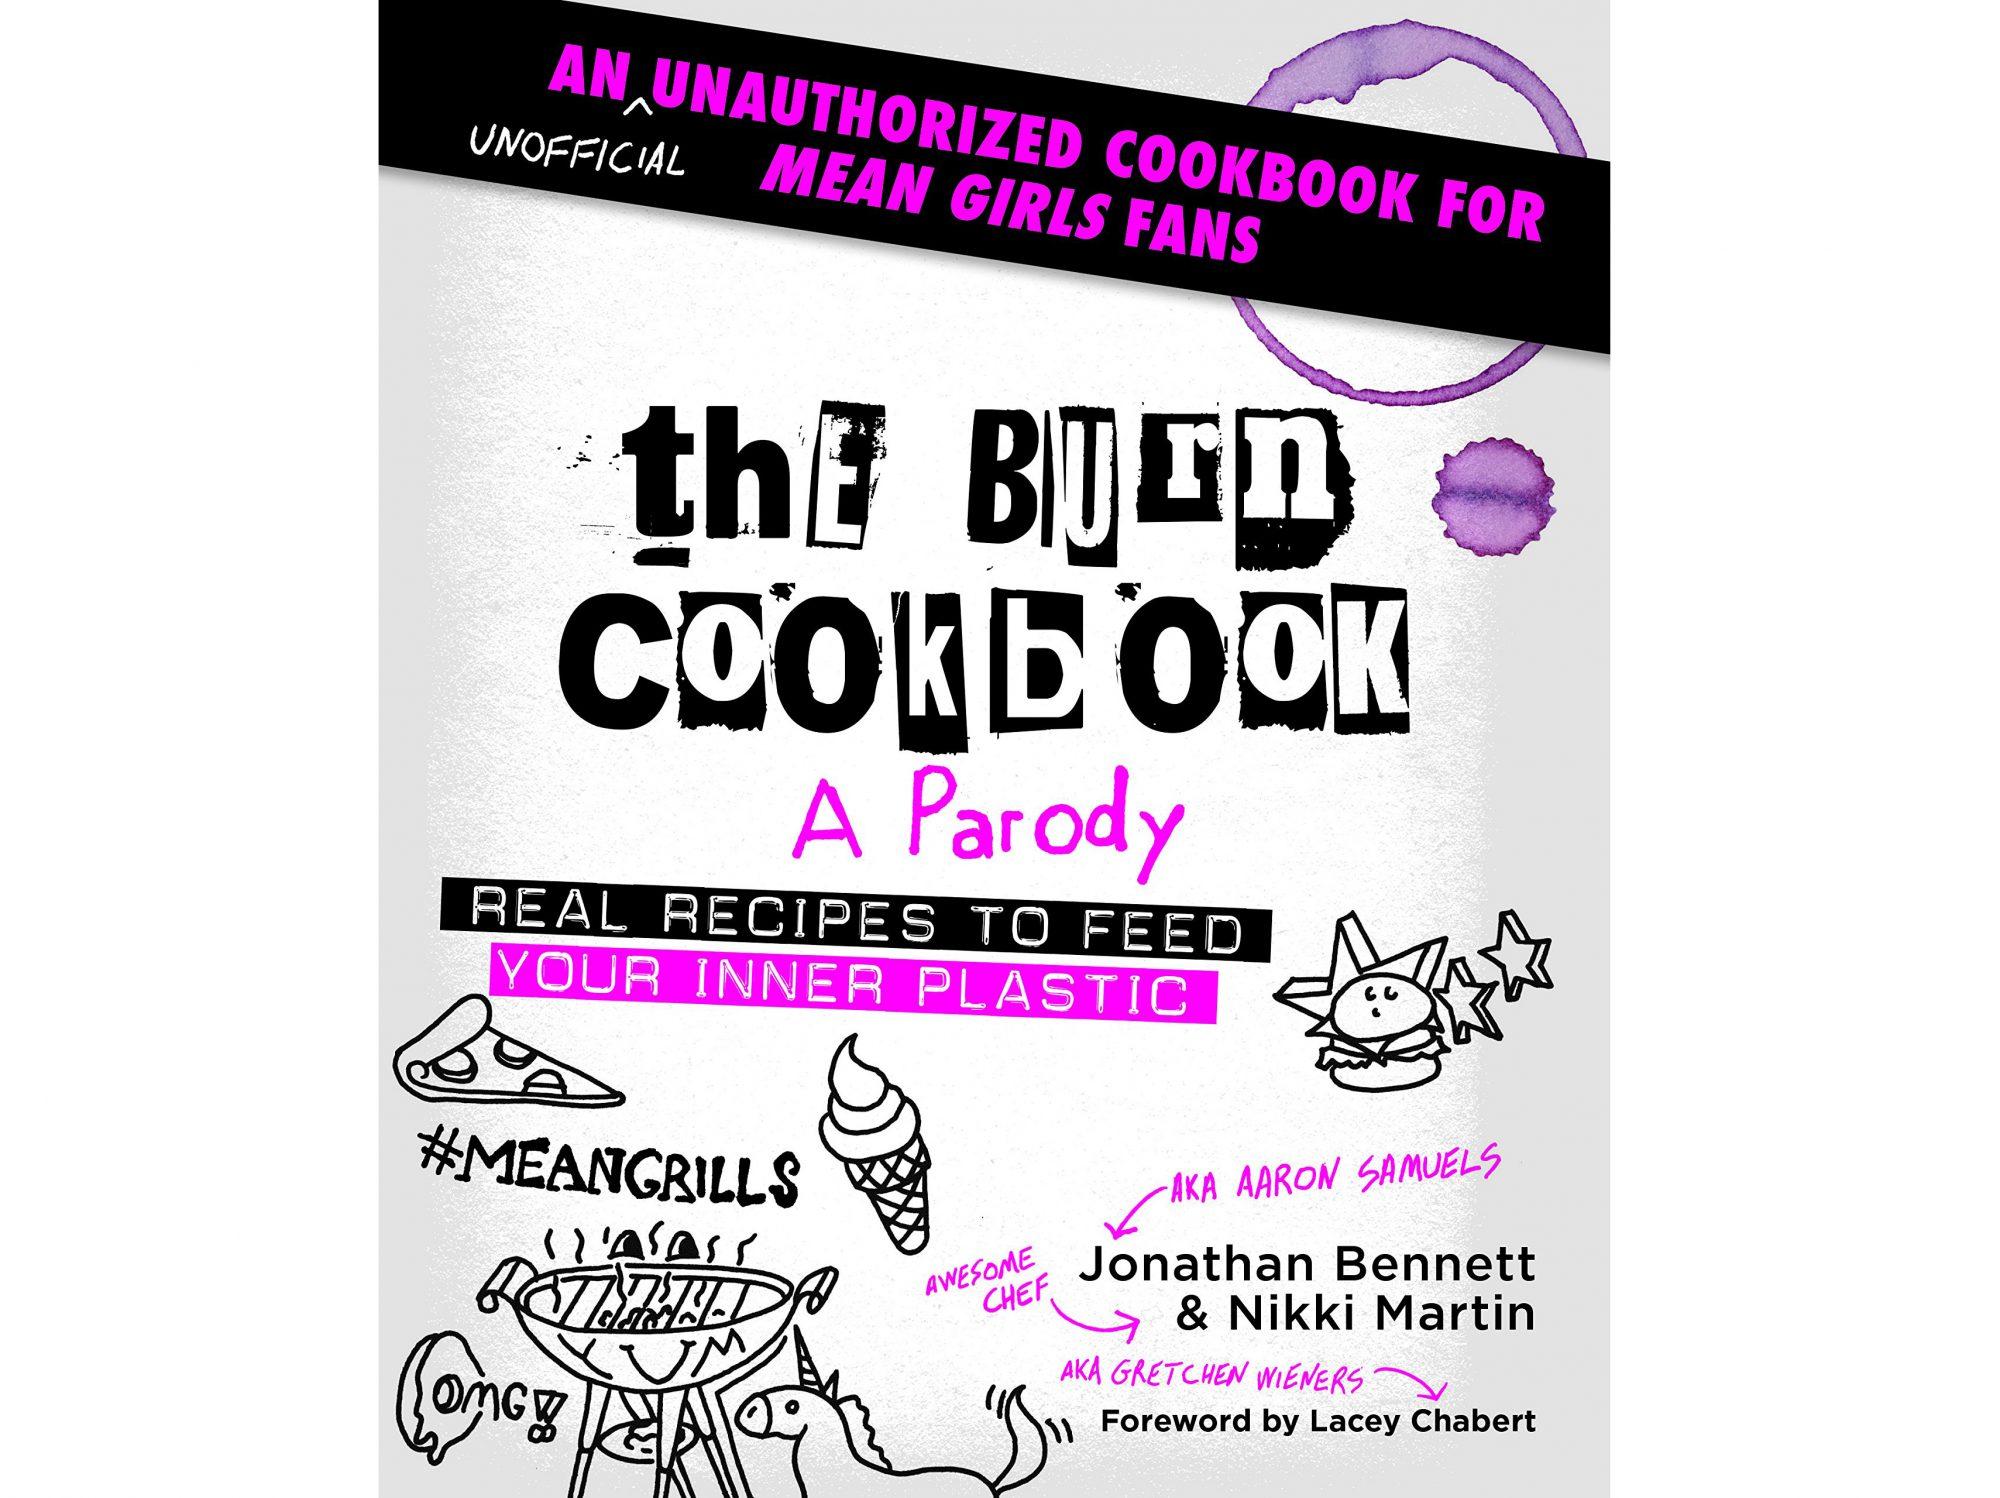 the burn cookbook.jpg